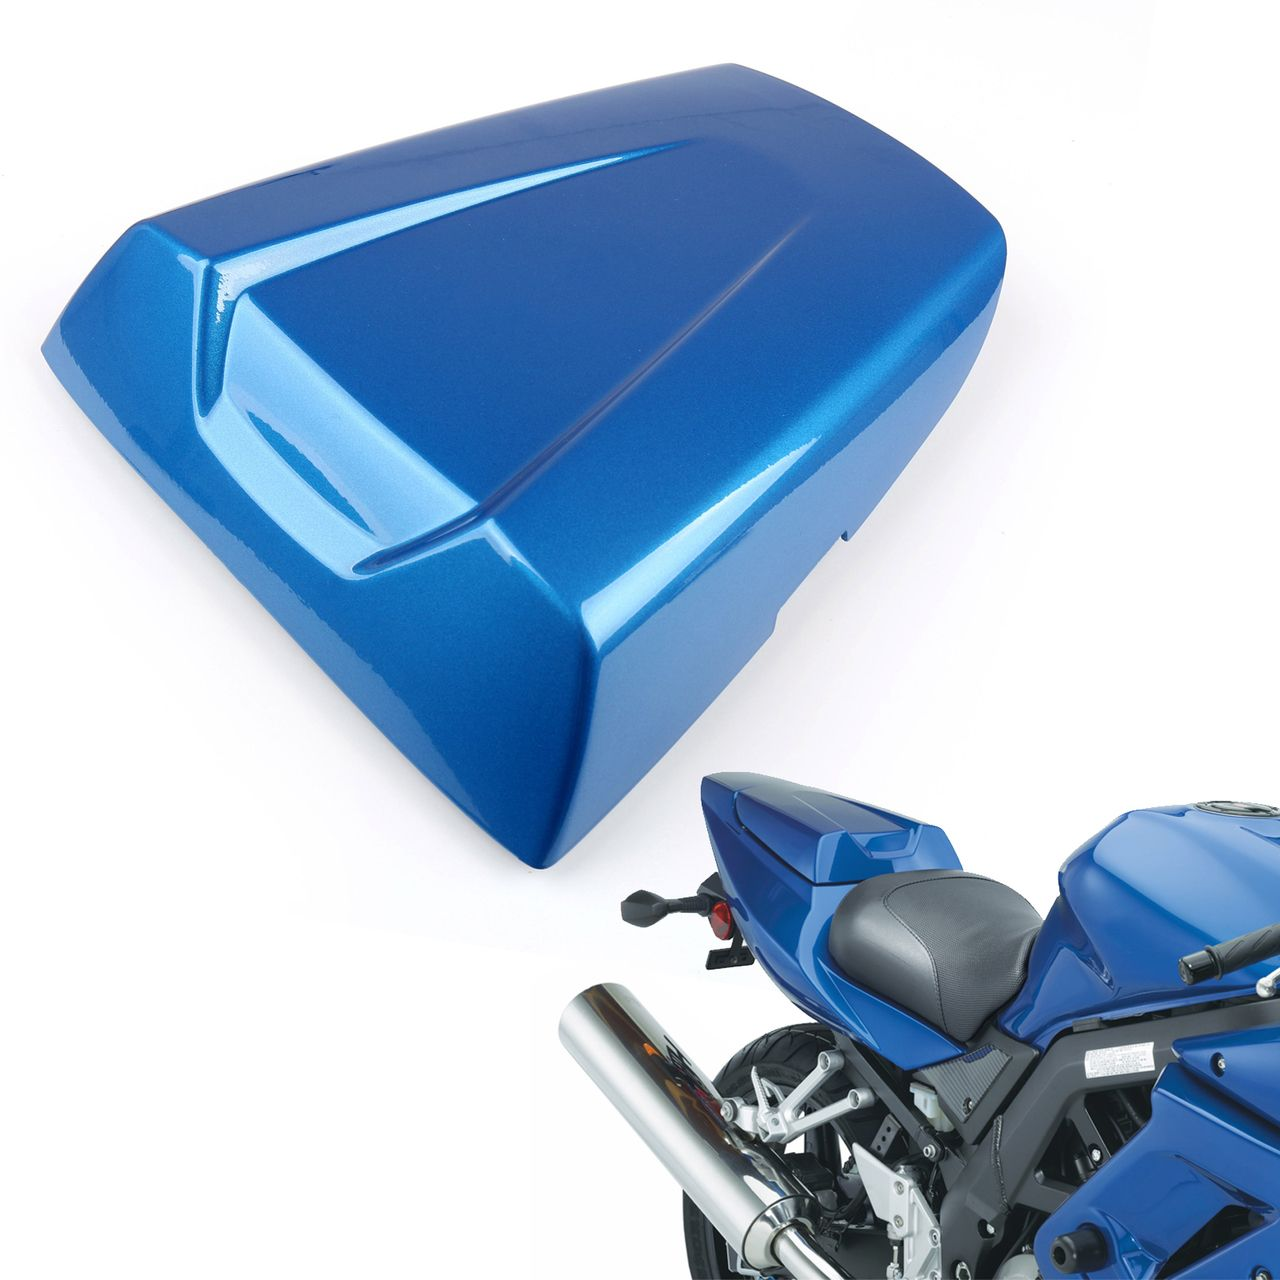 mad hornets rear passenger seat cover cowl suzuki sv650 sv1000 2003 2010 2004 2005 [ 1280 x 1280 Pixel ]